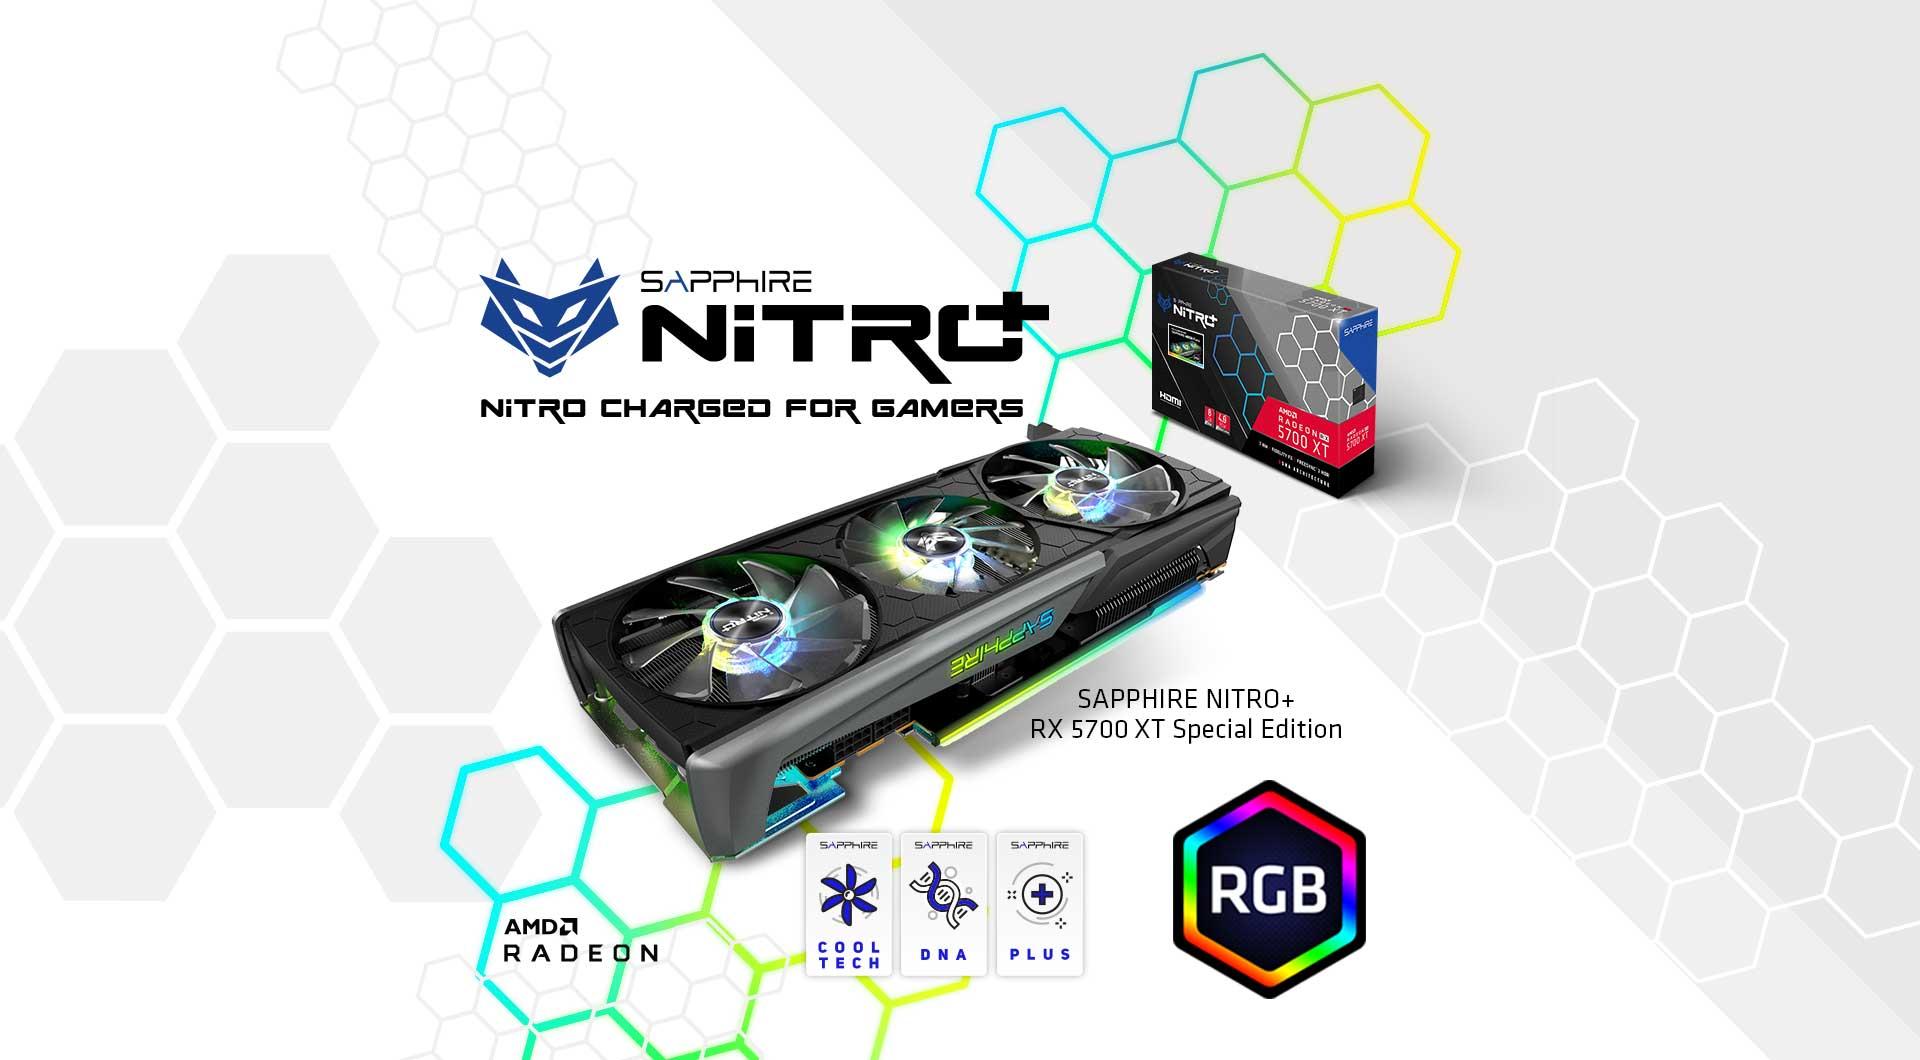 Sapphire nitro+ RX 5700 XT